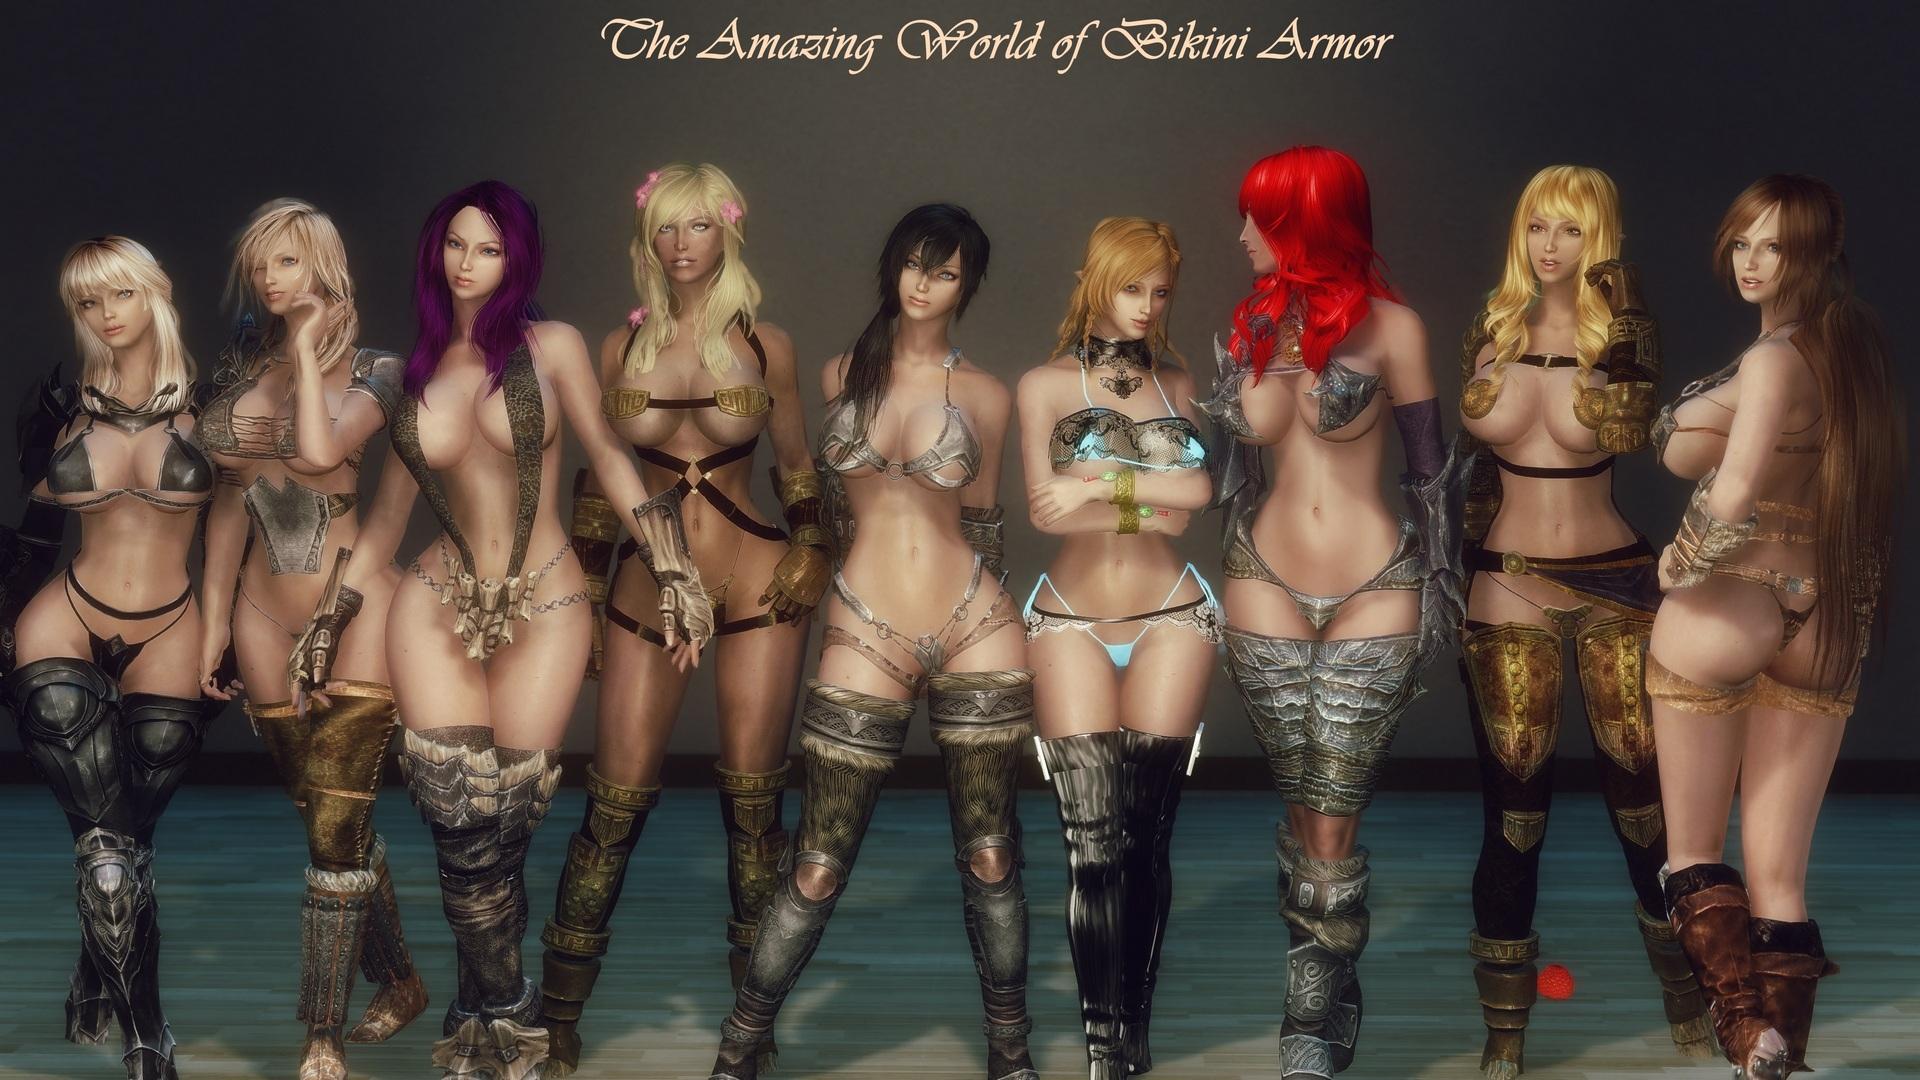 The Amazing World of Bikini Armor 00.jpg